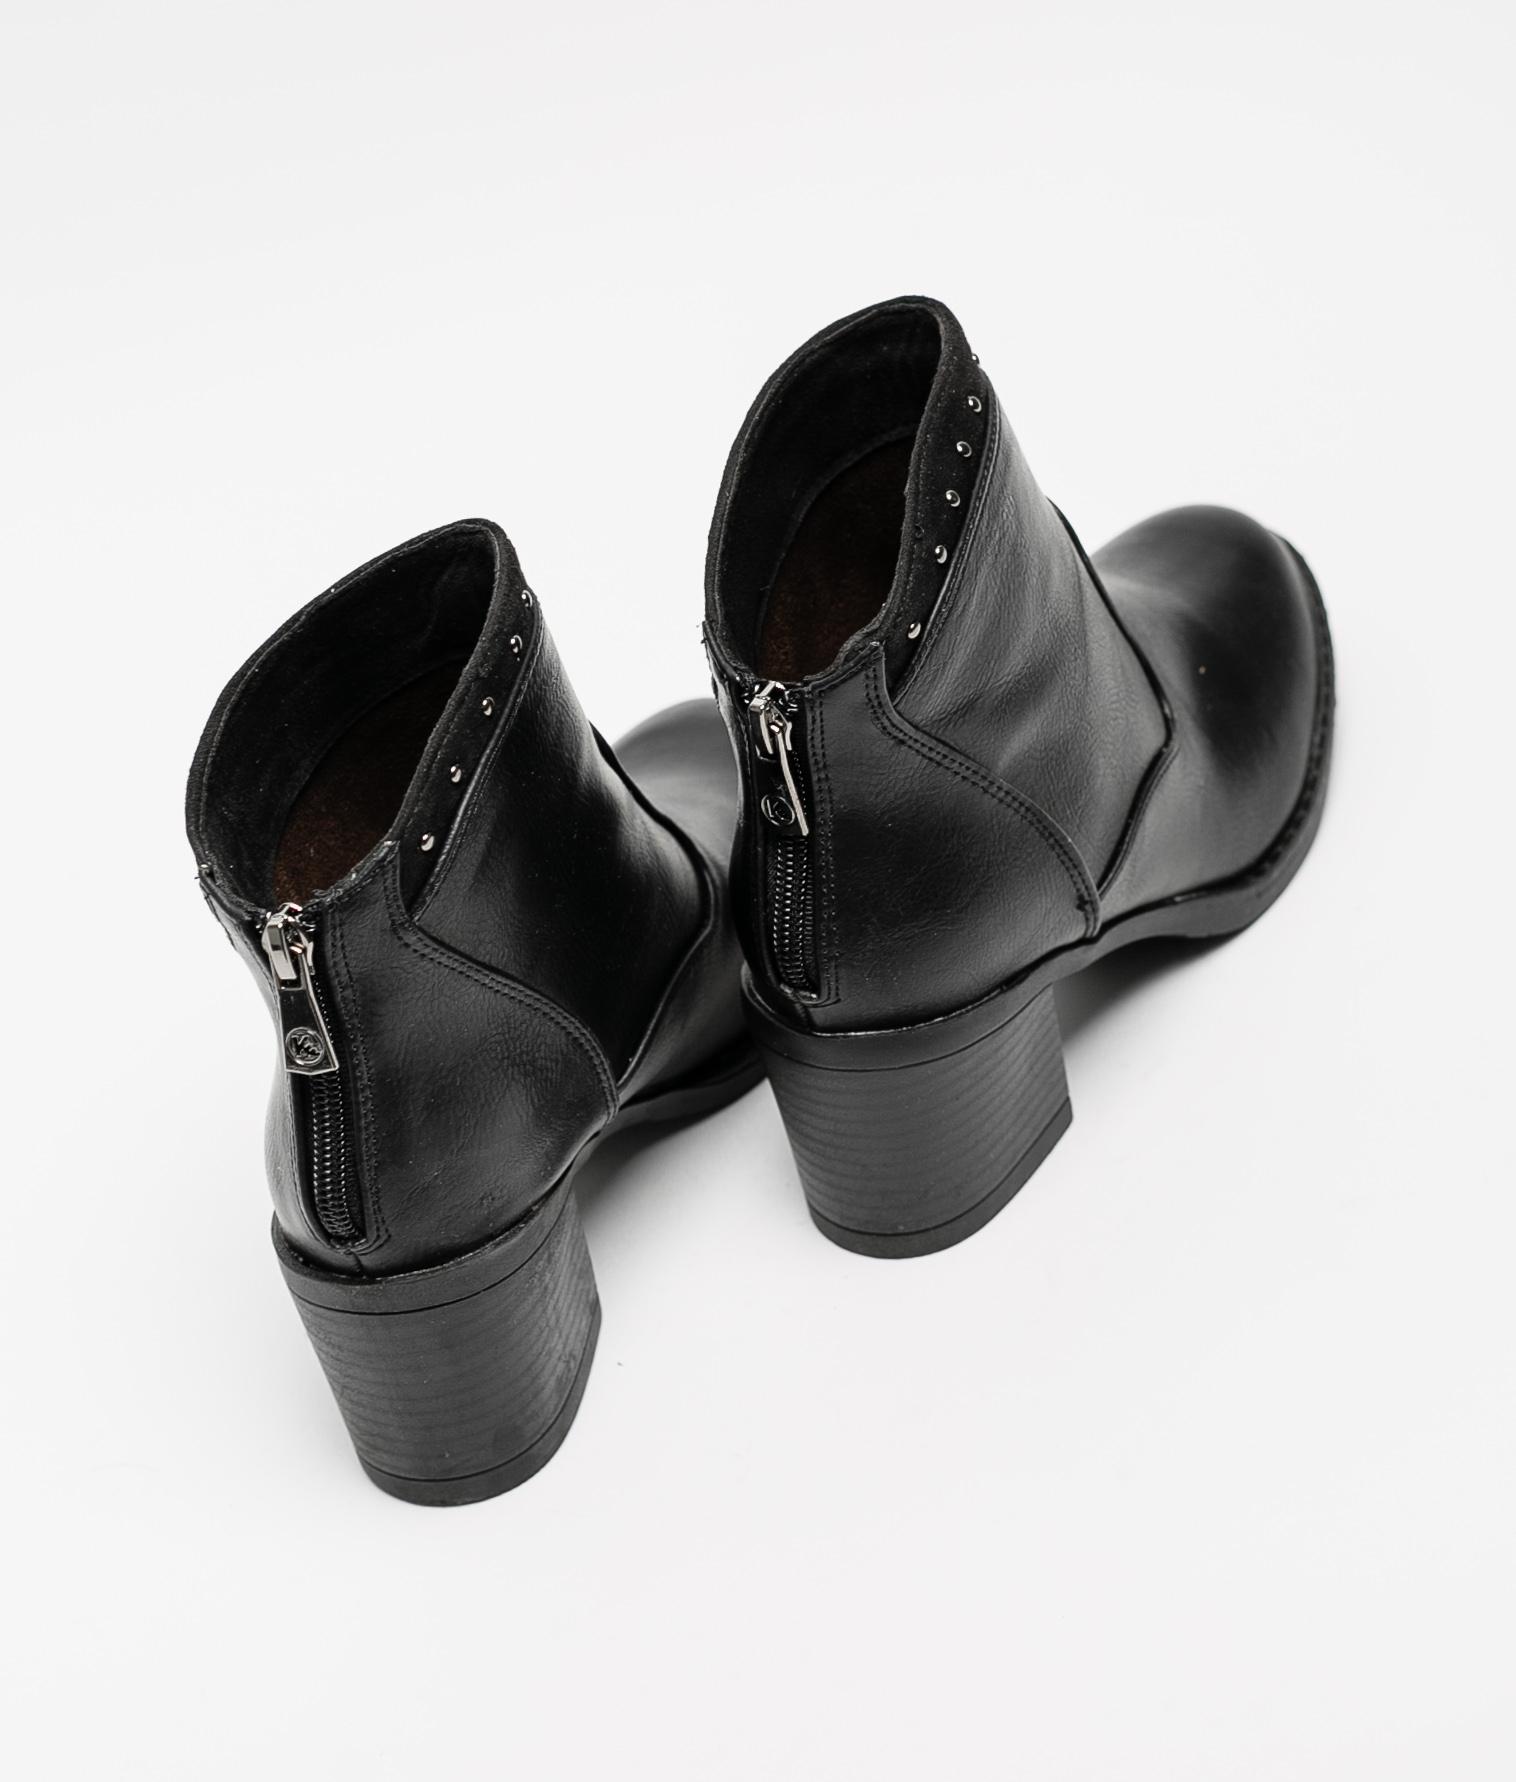 Boot Petite Tiusa - Noir